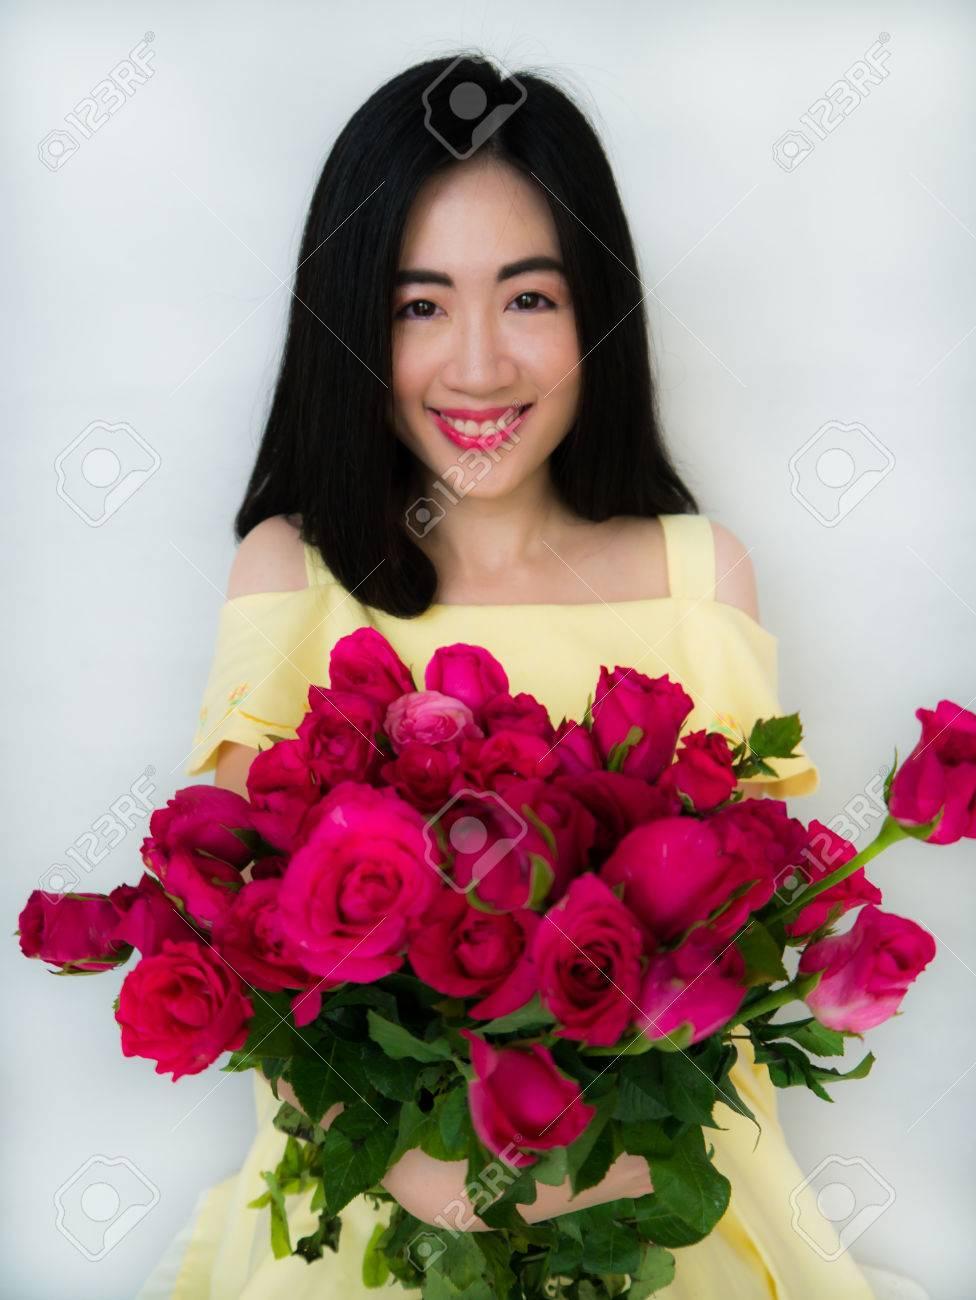 розы в руках у девушки фото